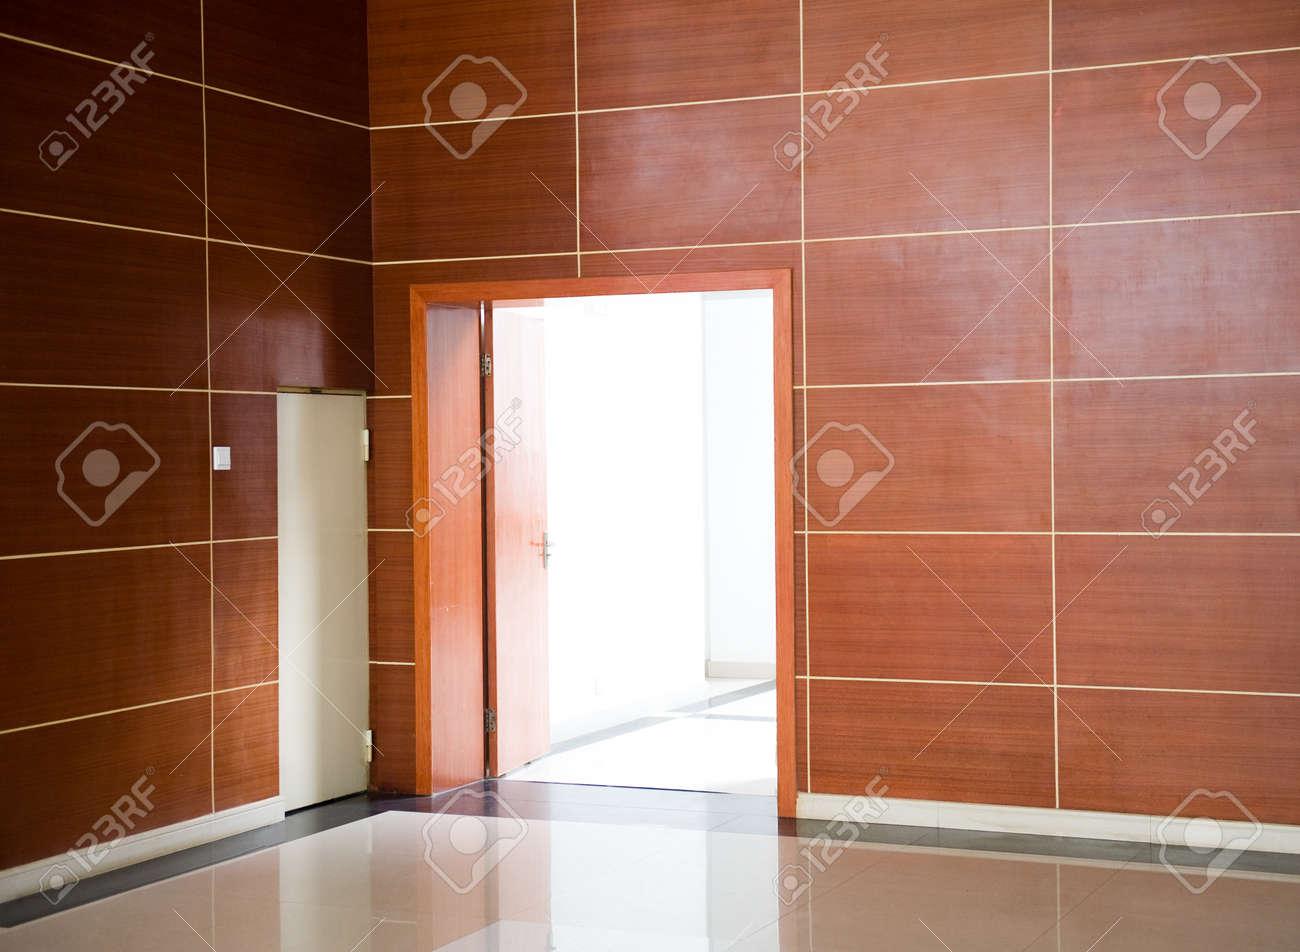 the empty room with opened door. Stock Photo - 14177267